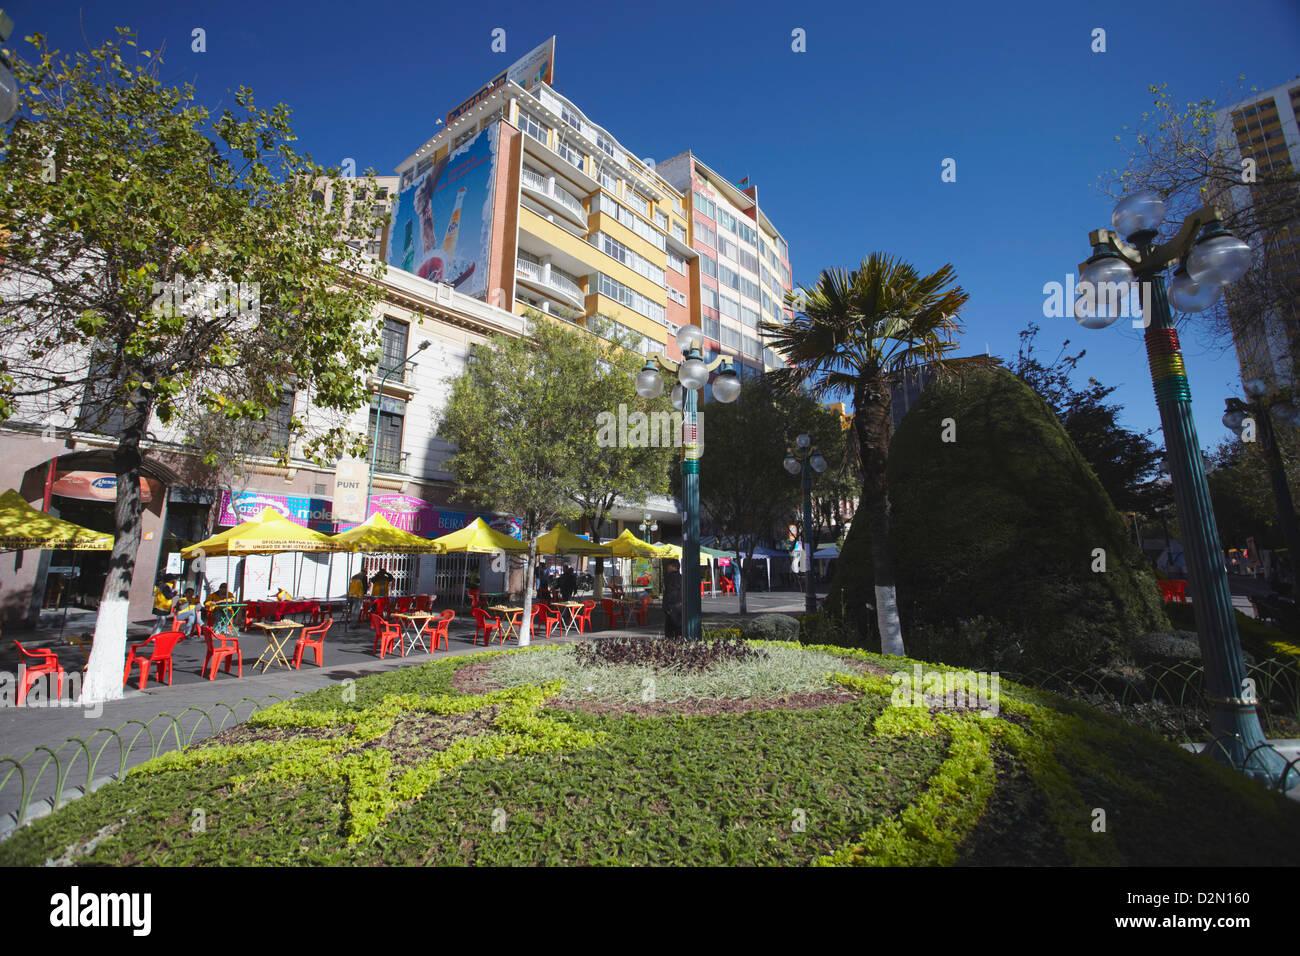 Avenida 16 de Julio (El Prado), La Paz, Bolivia, South America - Stock Image